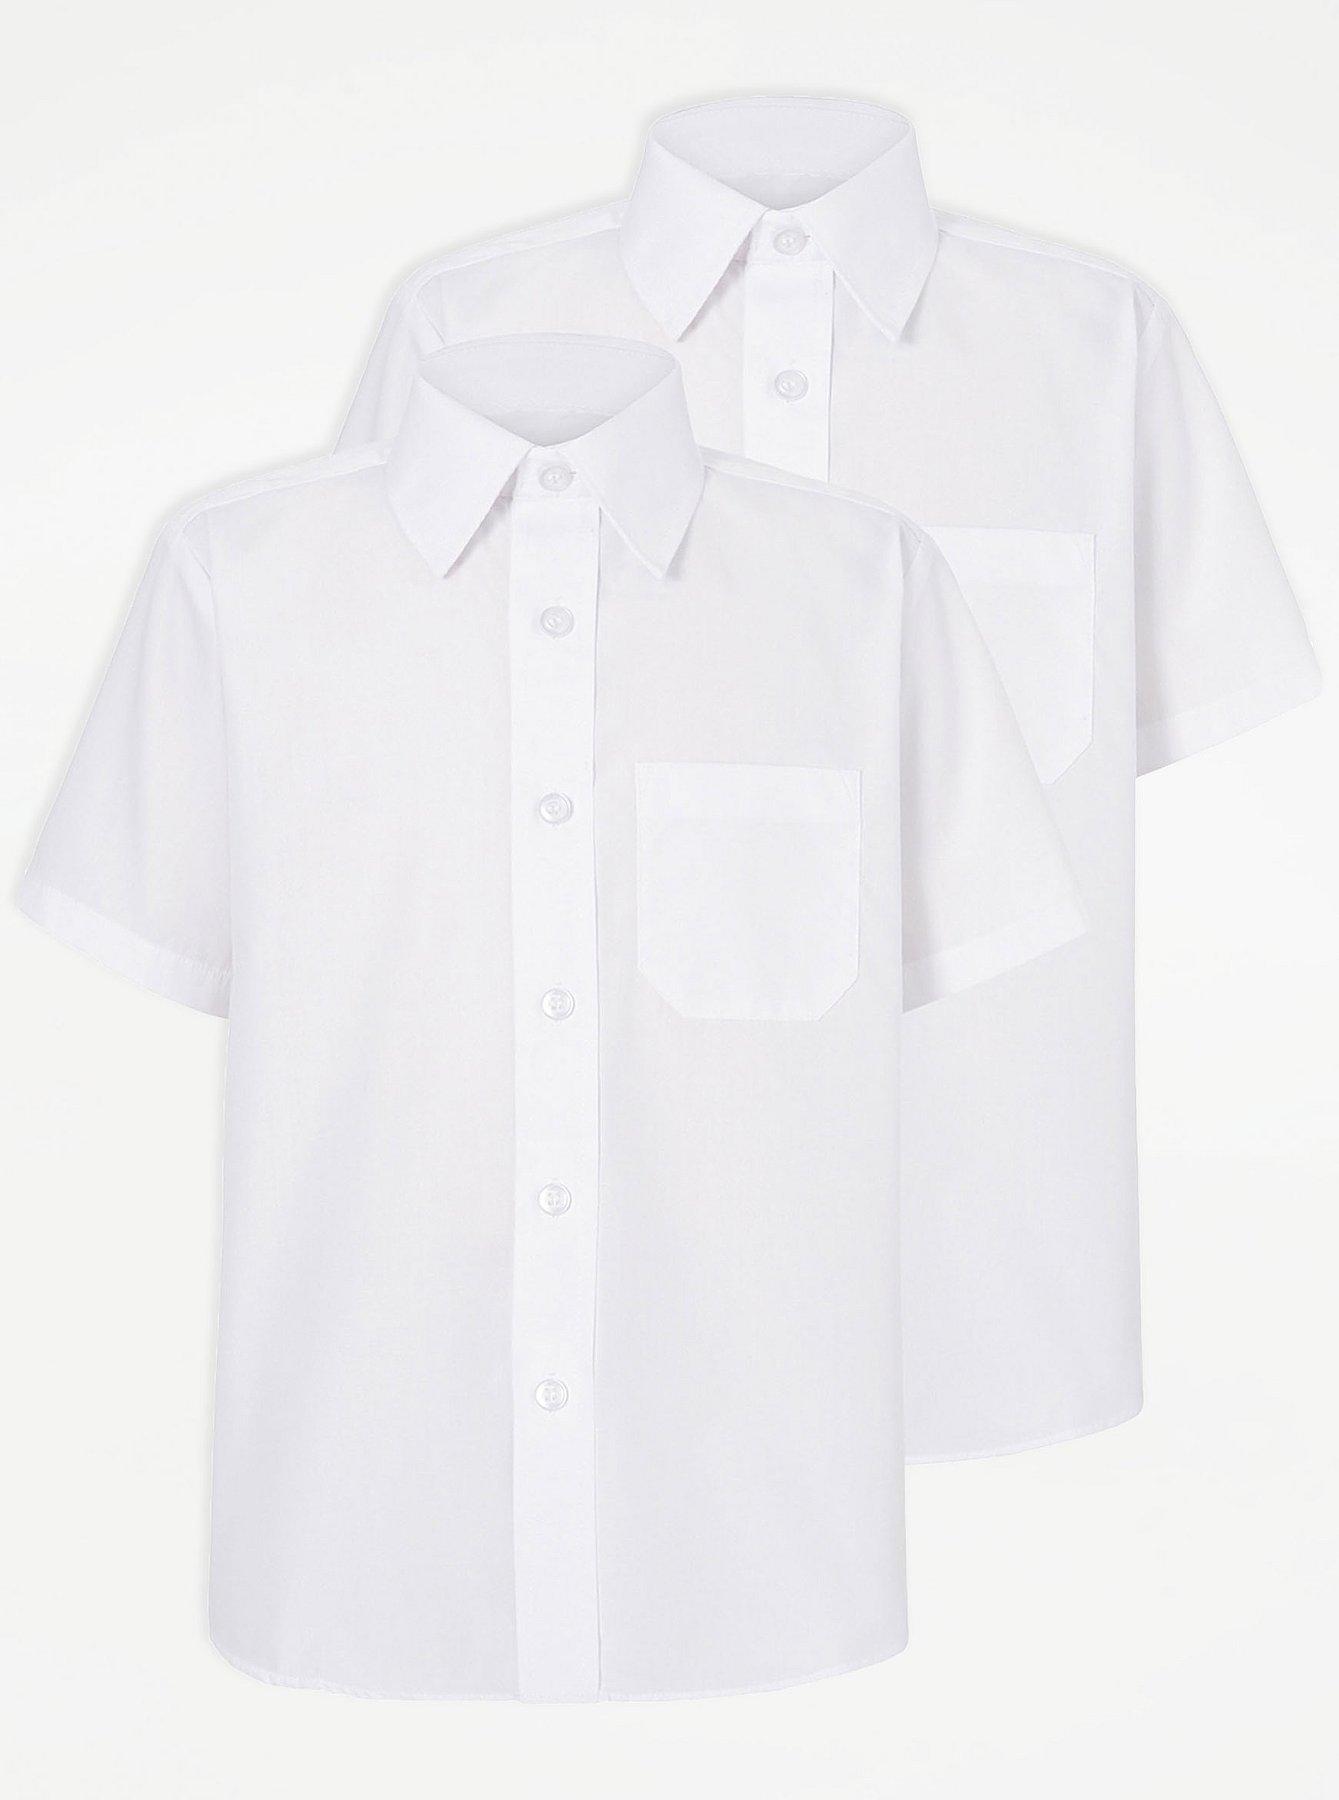 Boys School 2 Pack Short Sleeve Shirts - White | School | George at ASDA